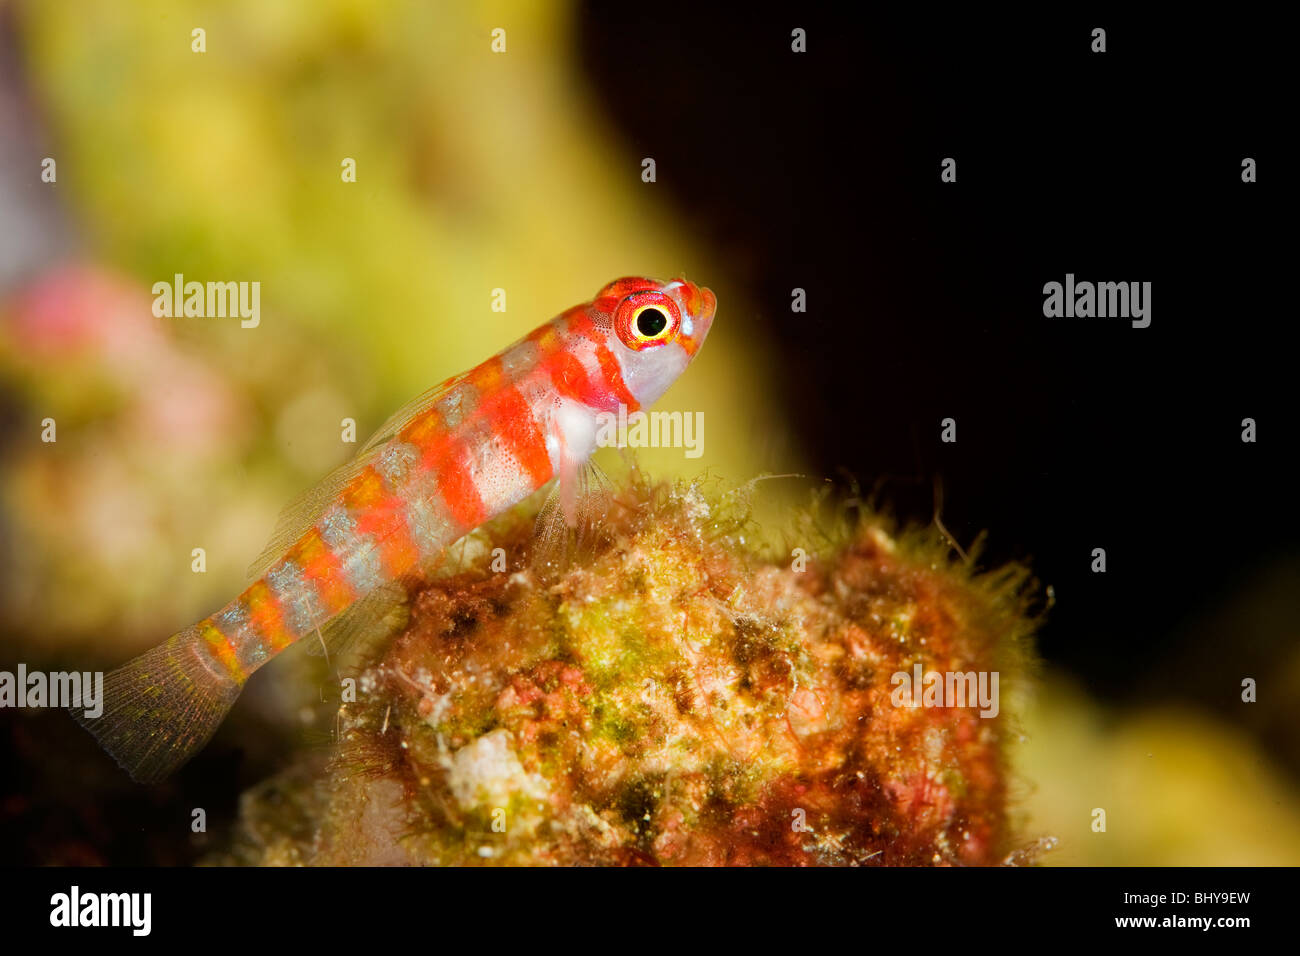 Candycane Dwarf Goby (Trimma sp.) - Milne Bay, PNG - Stock Image